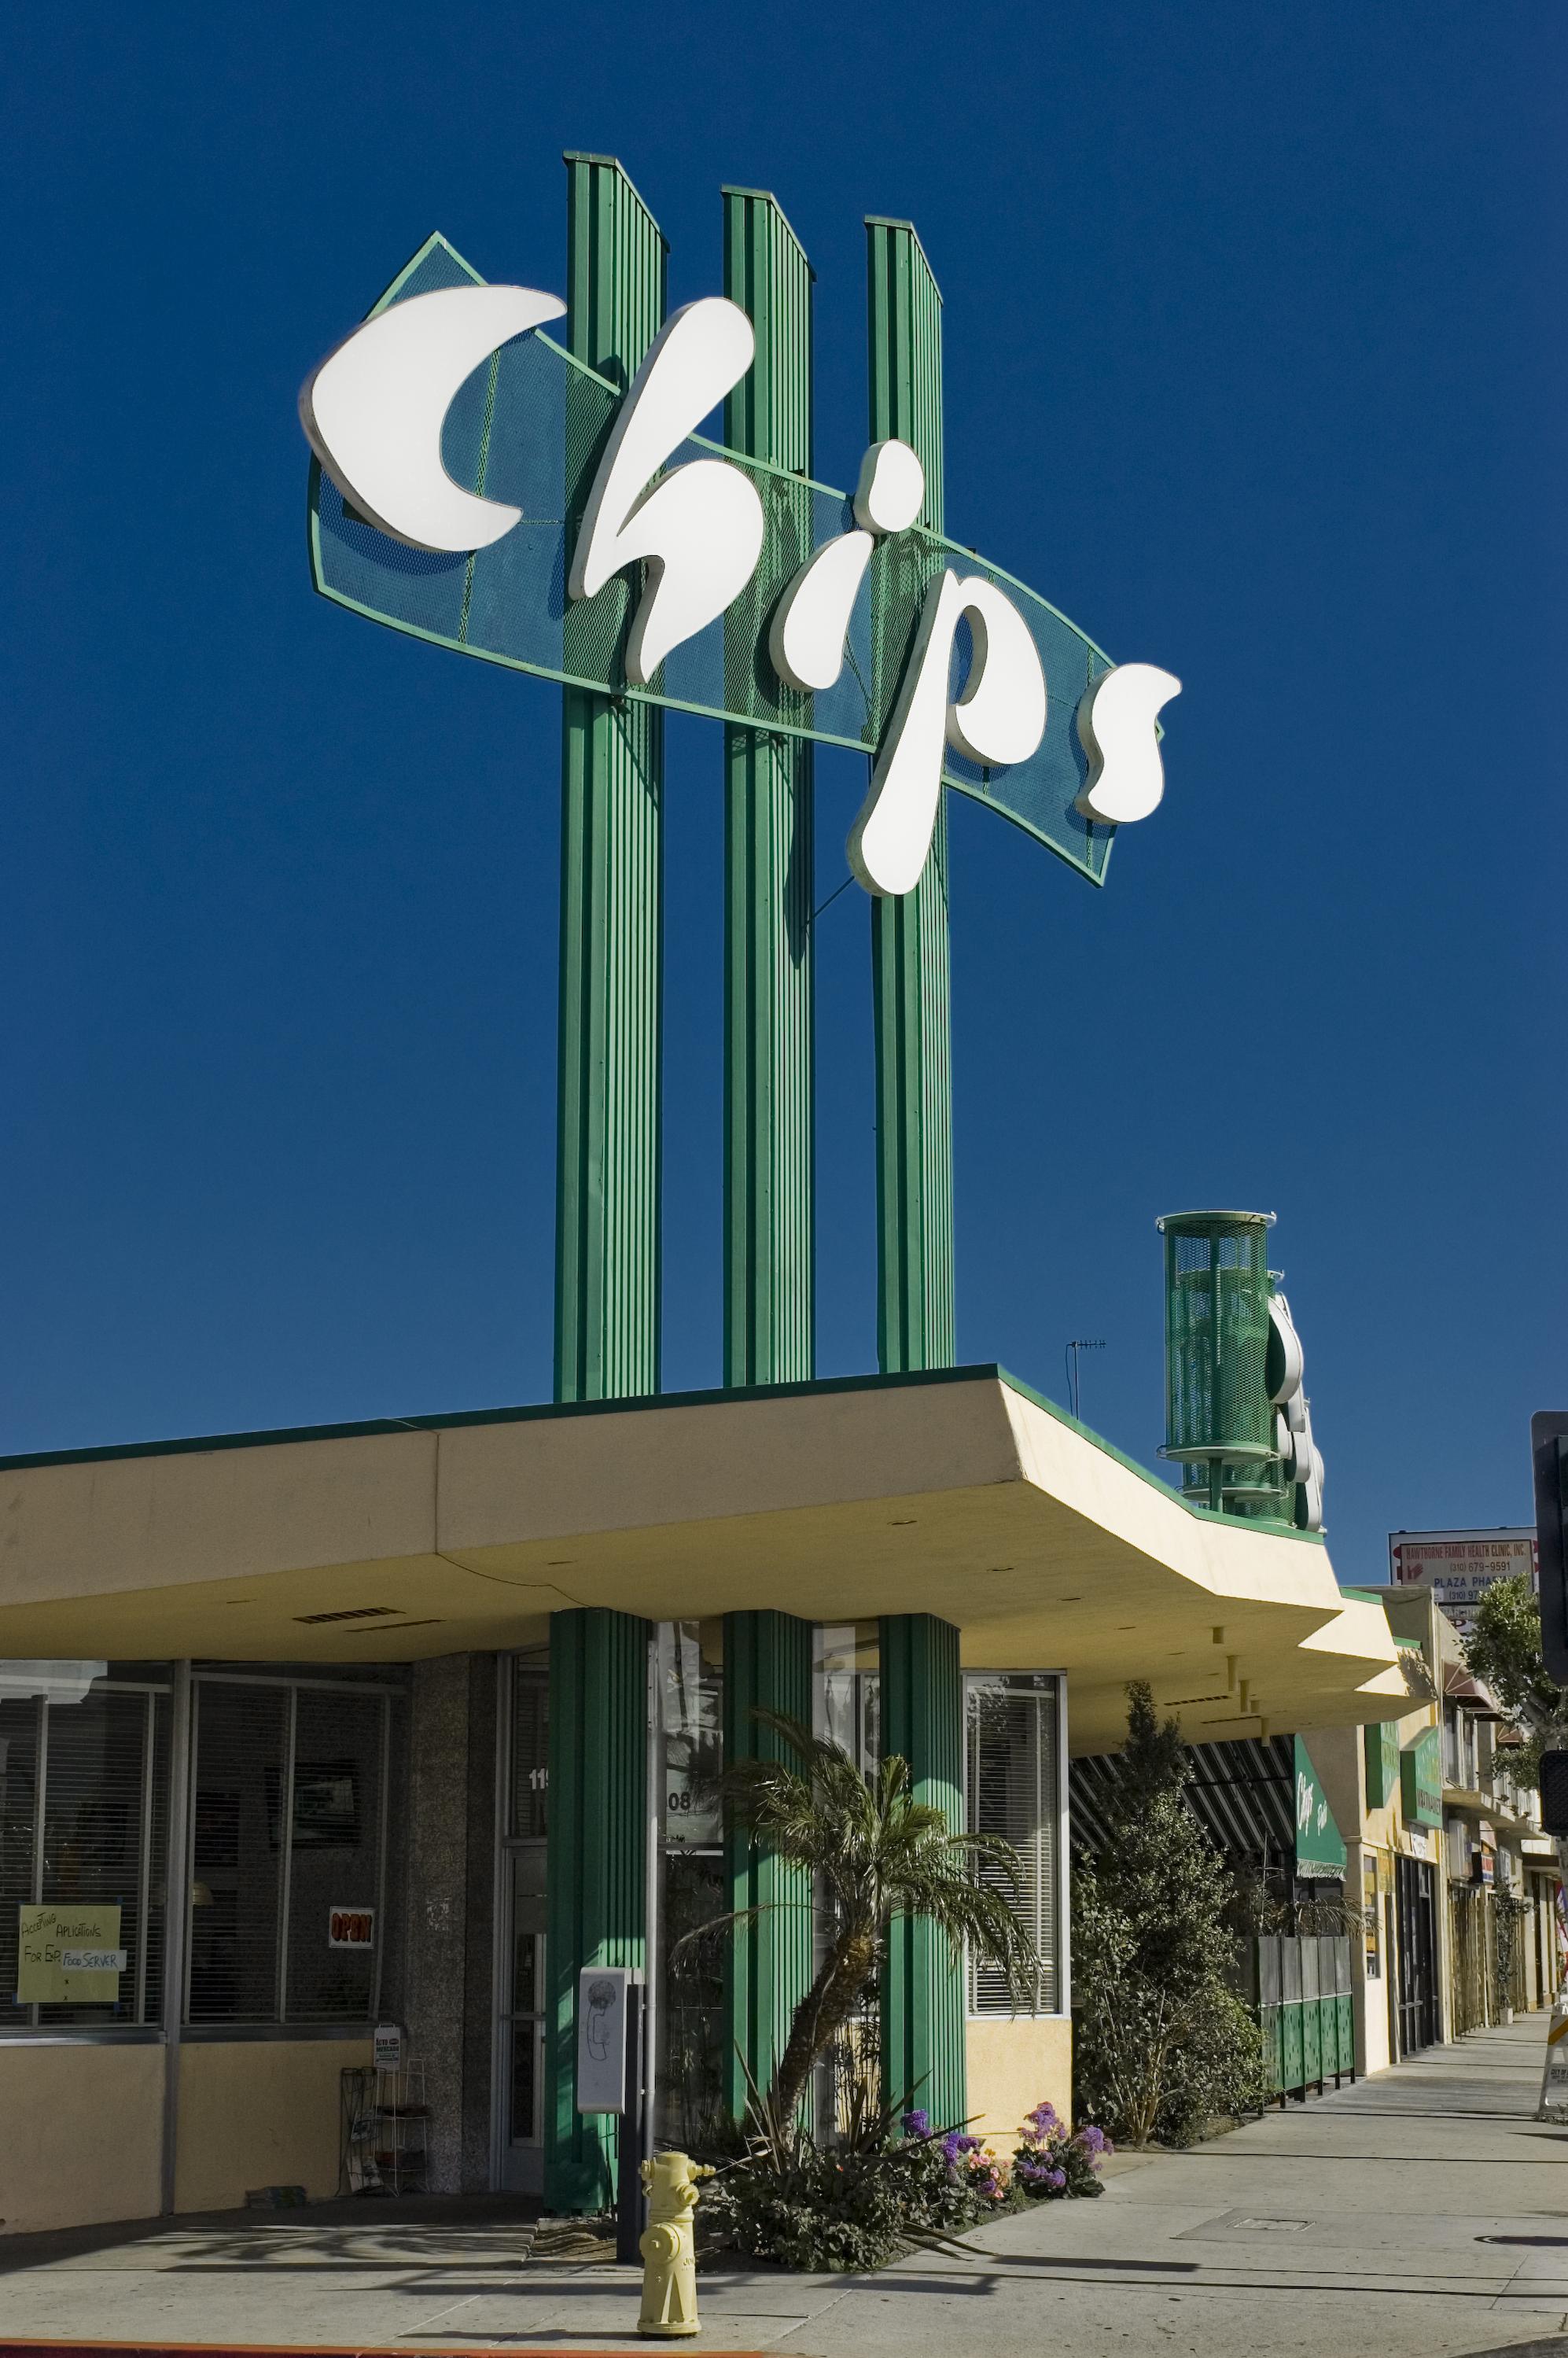 Chips Restaurant - 11908 Hawthorne Boulevard, Hawthorne, California U.S.A. - April 21, 2007